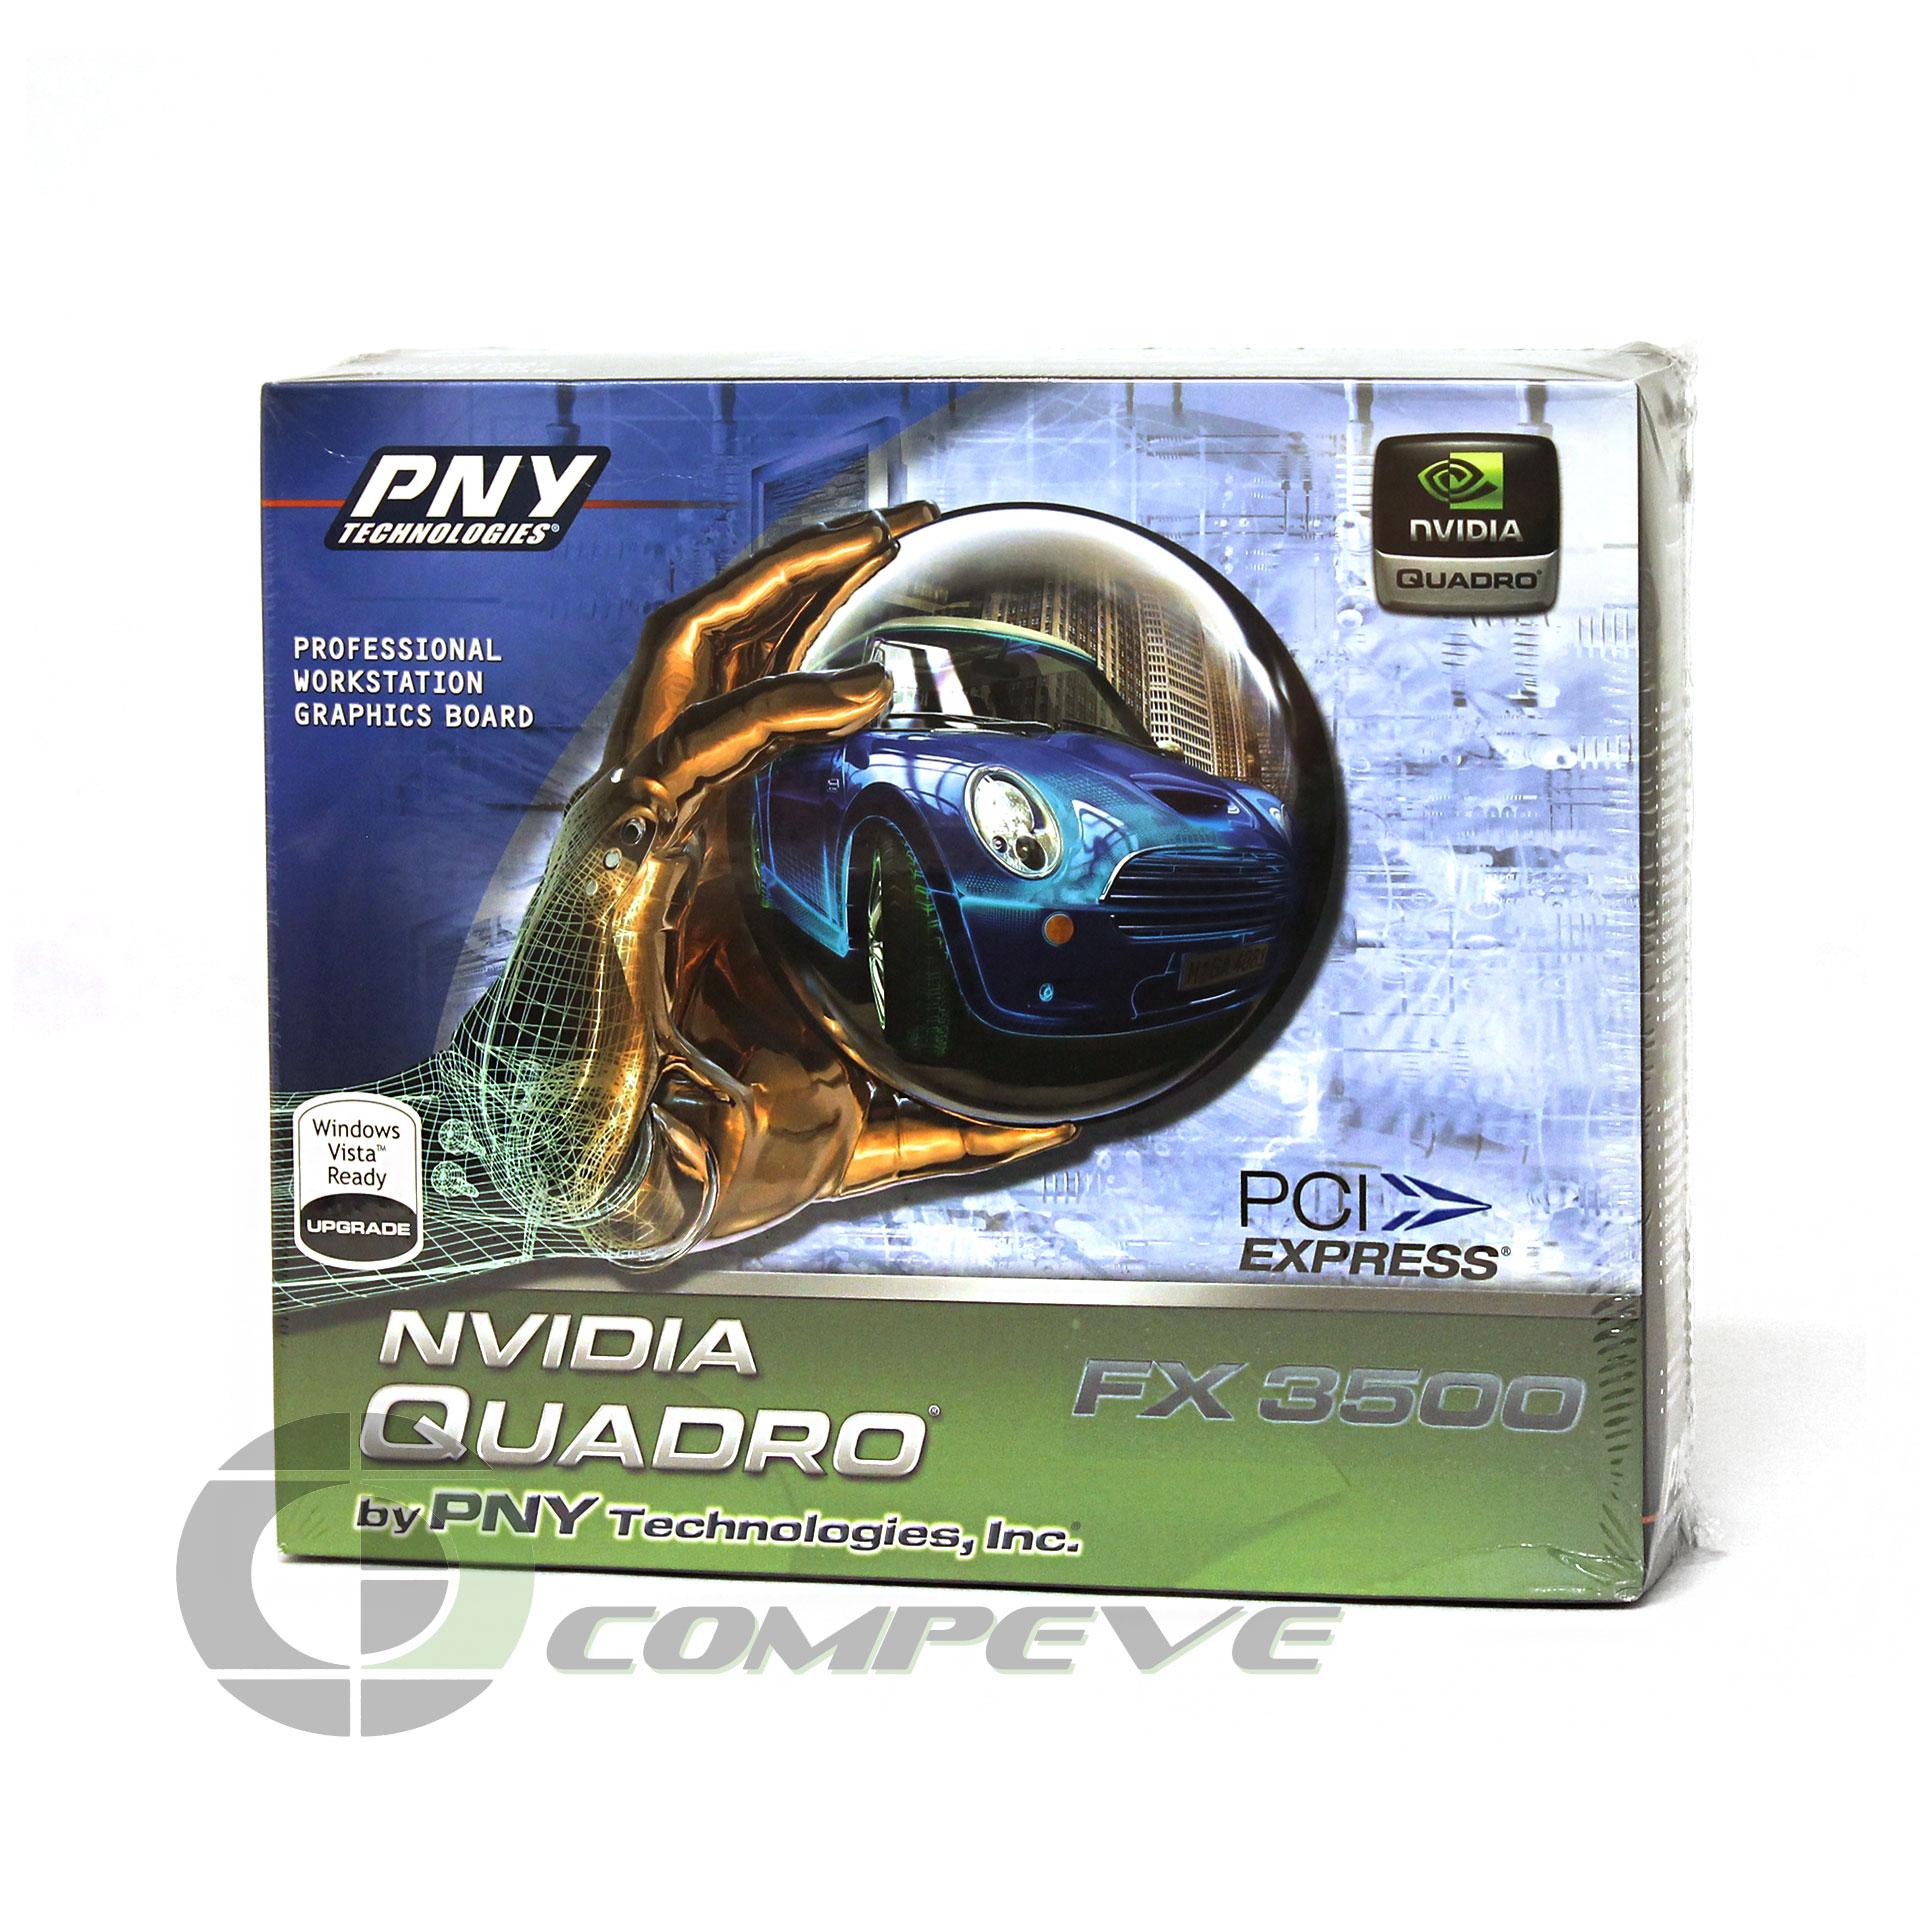 PNY Nvidia Quadro FX 3500 PCIe x16 256MB Dual DVI Video Card [FX